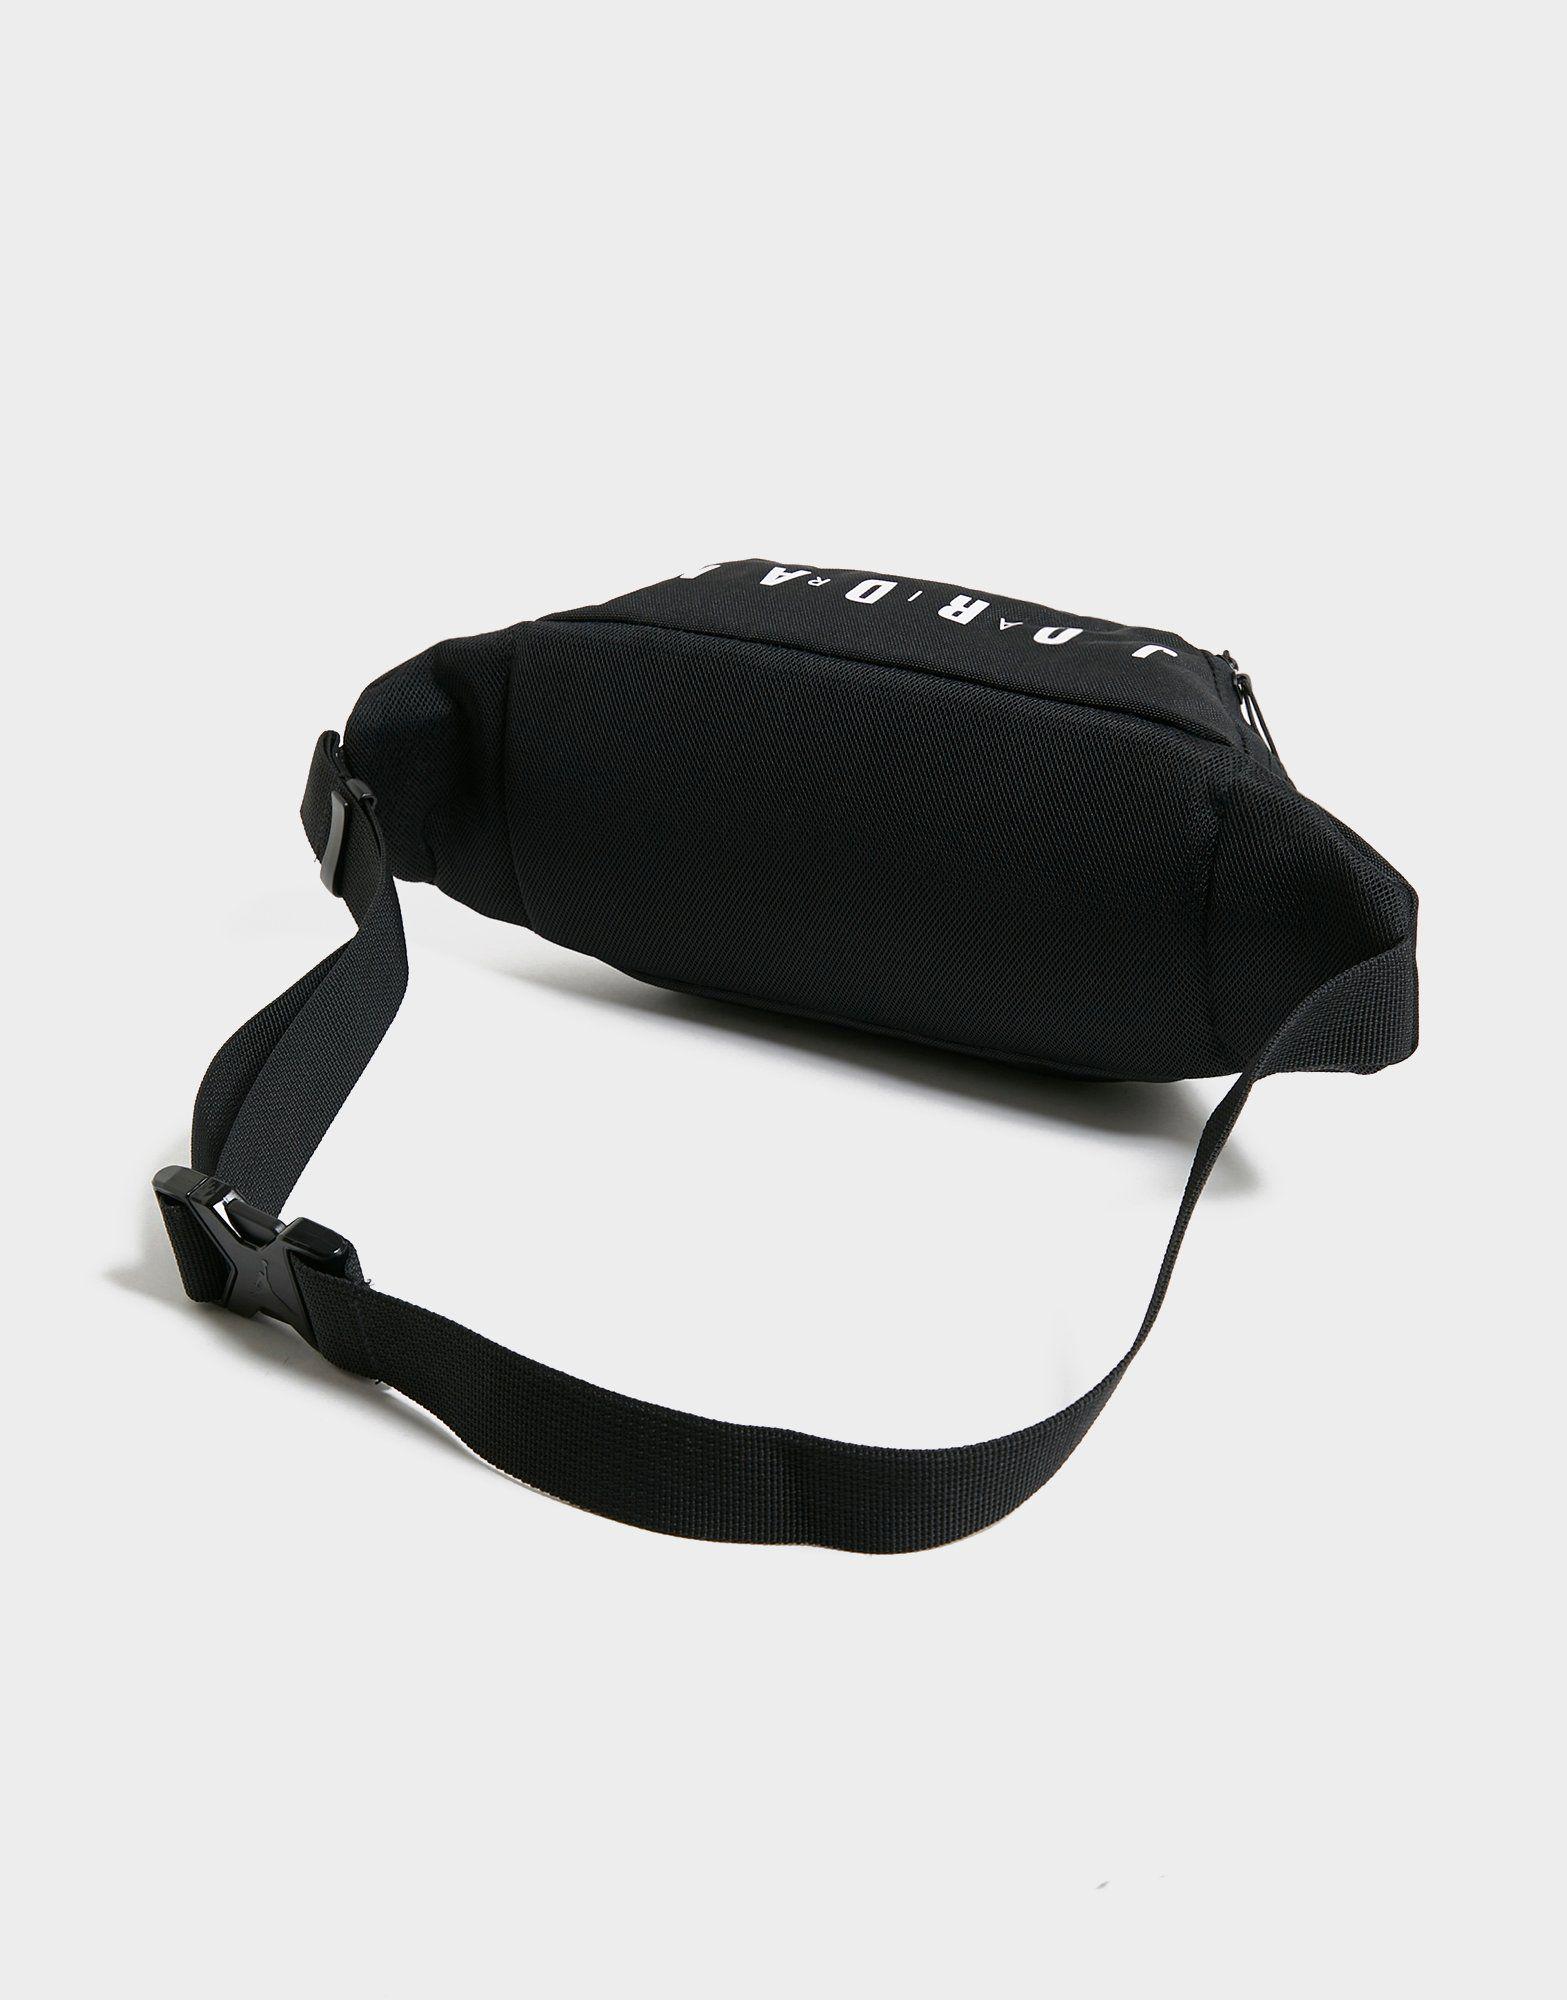 Jordan Waist Bag